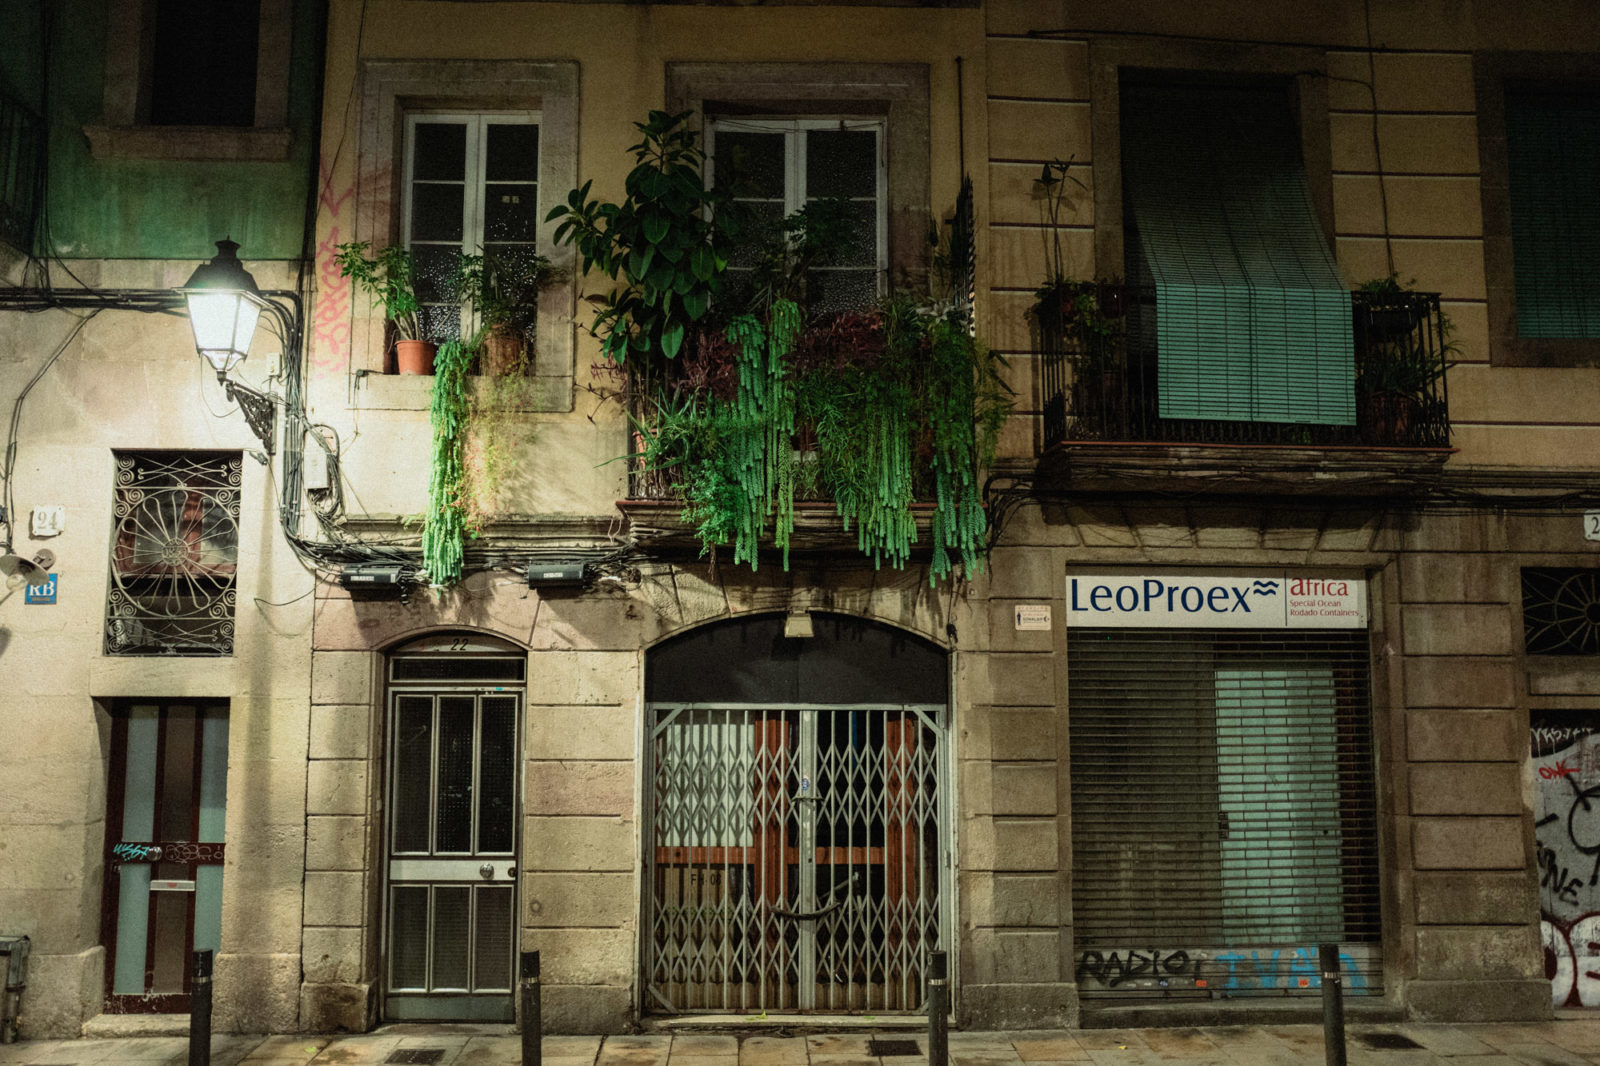 Barcelona Street-1090691